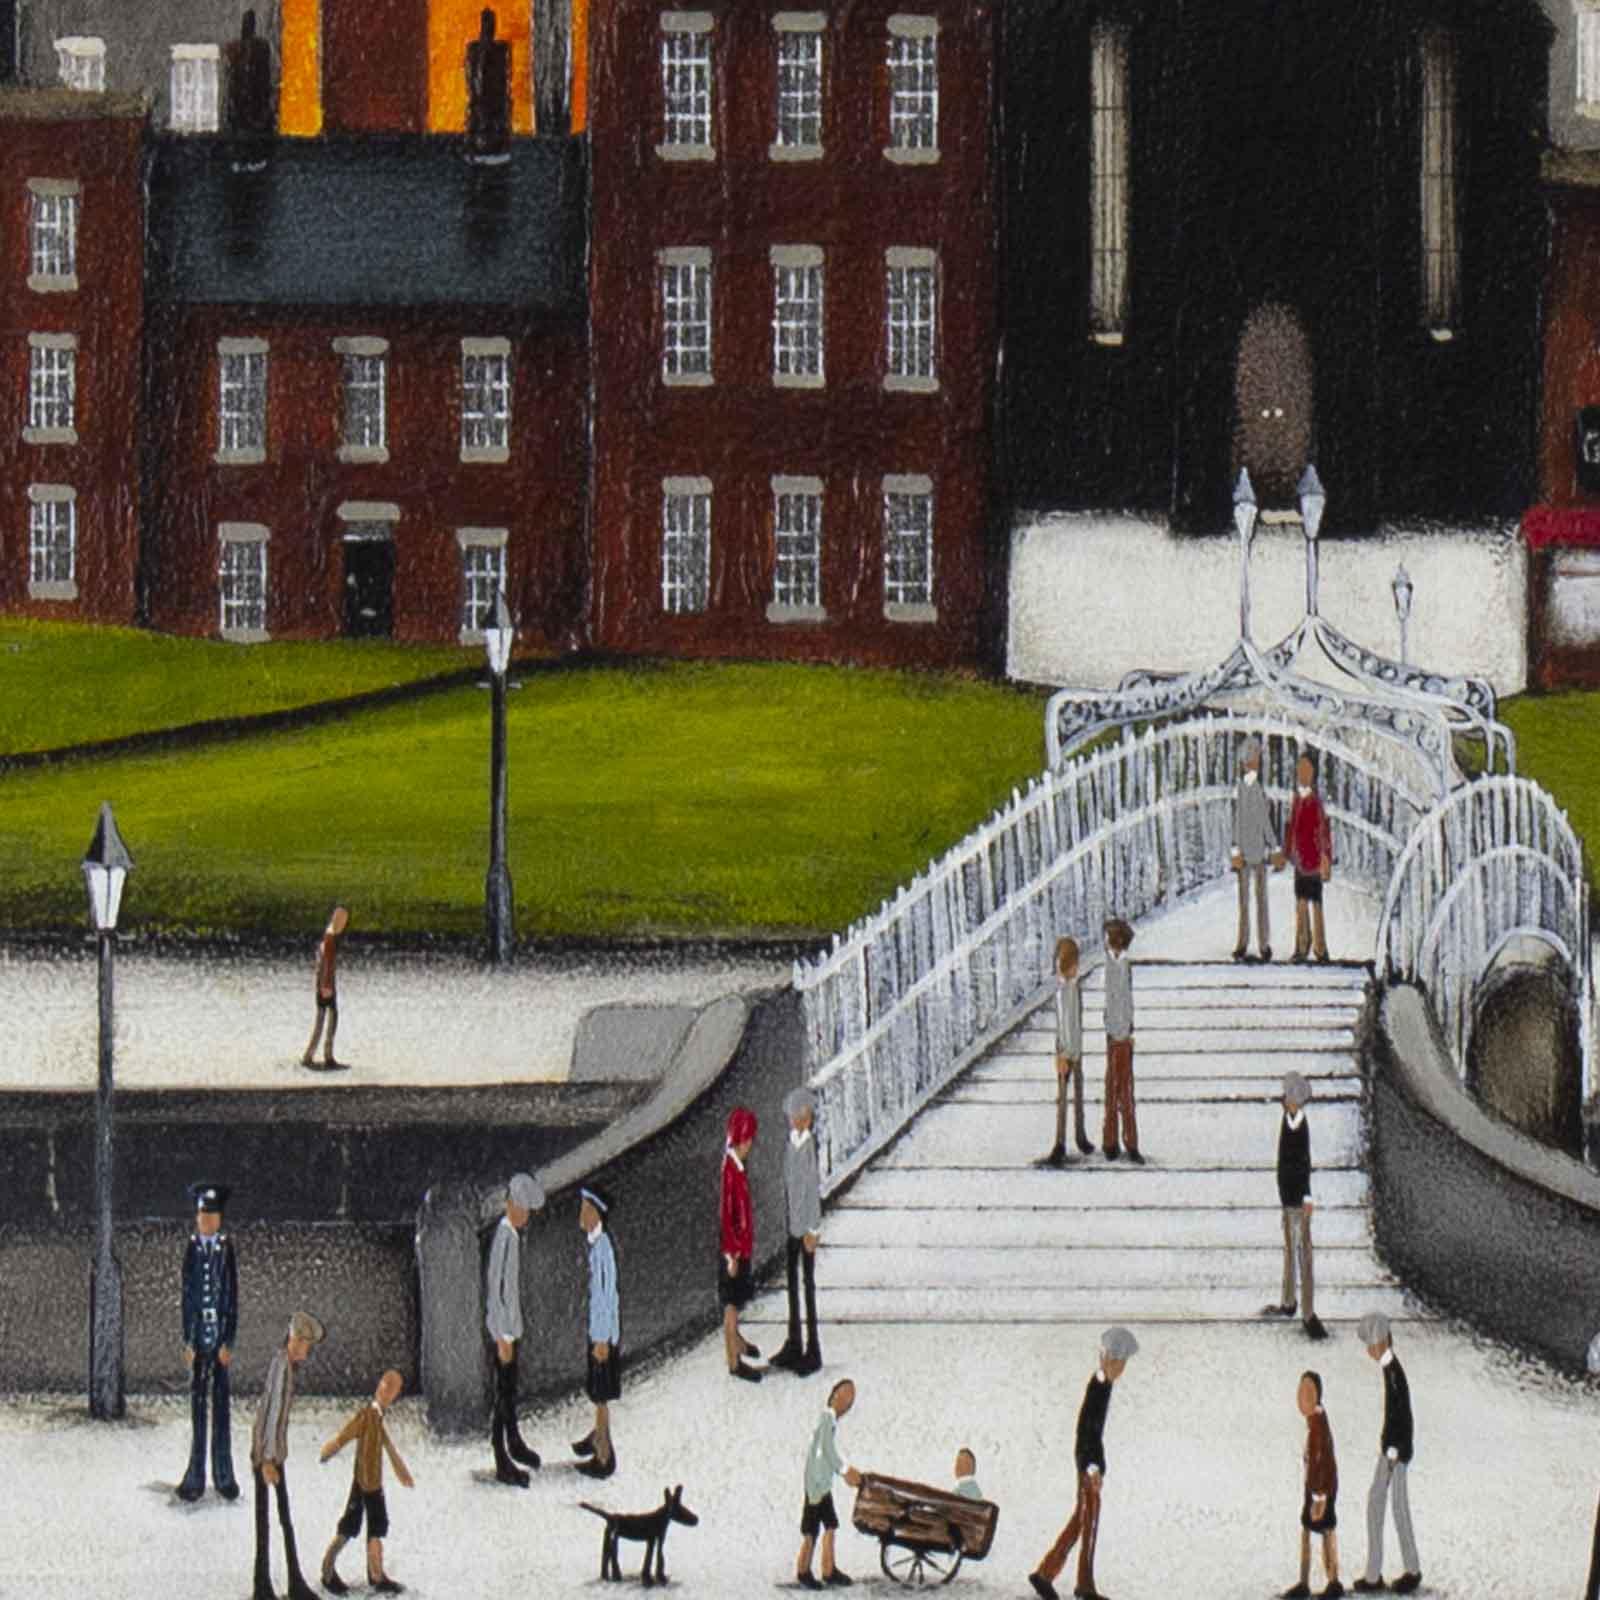 Half Penny Bridge Commission